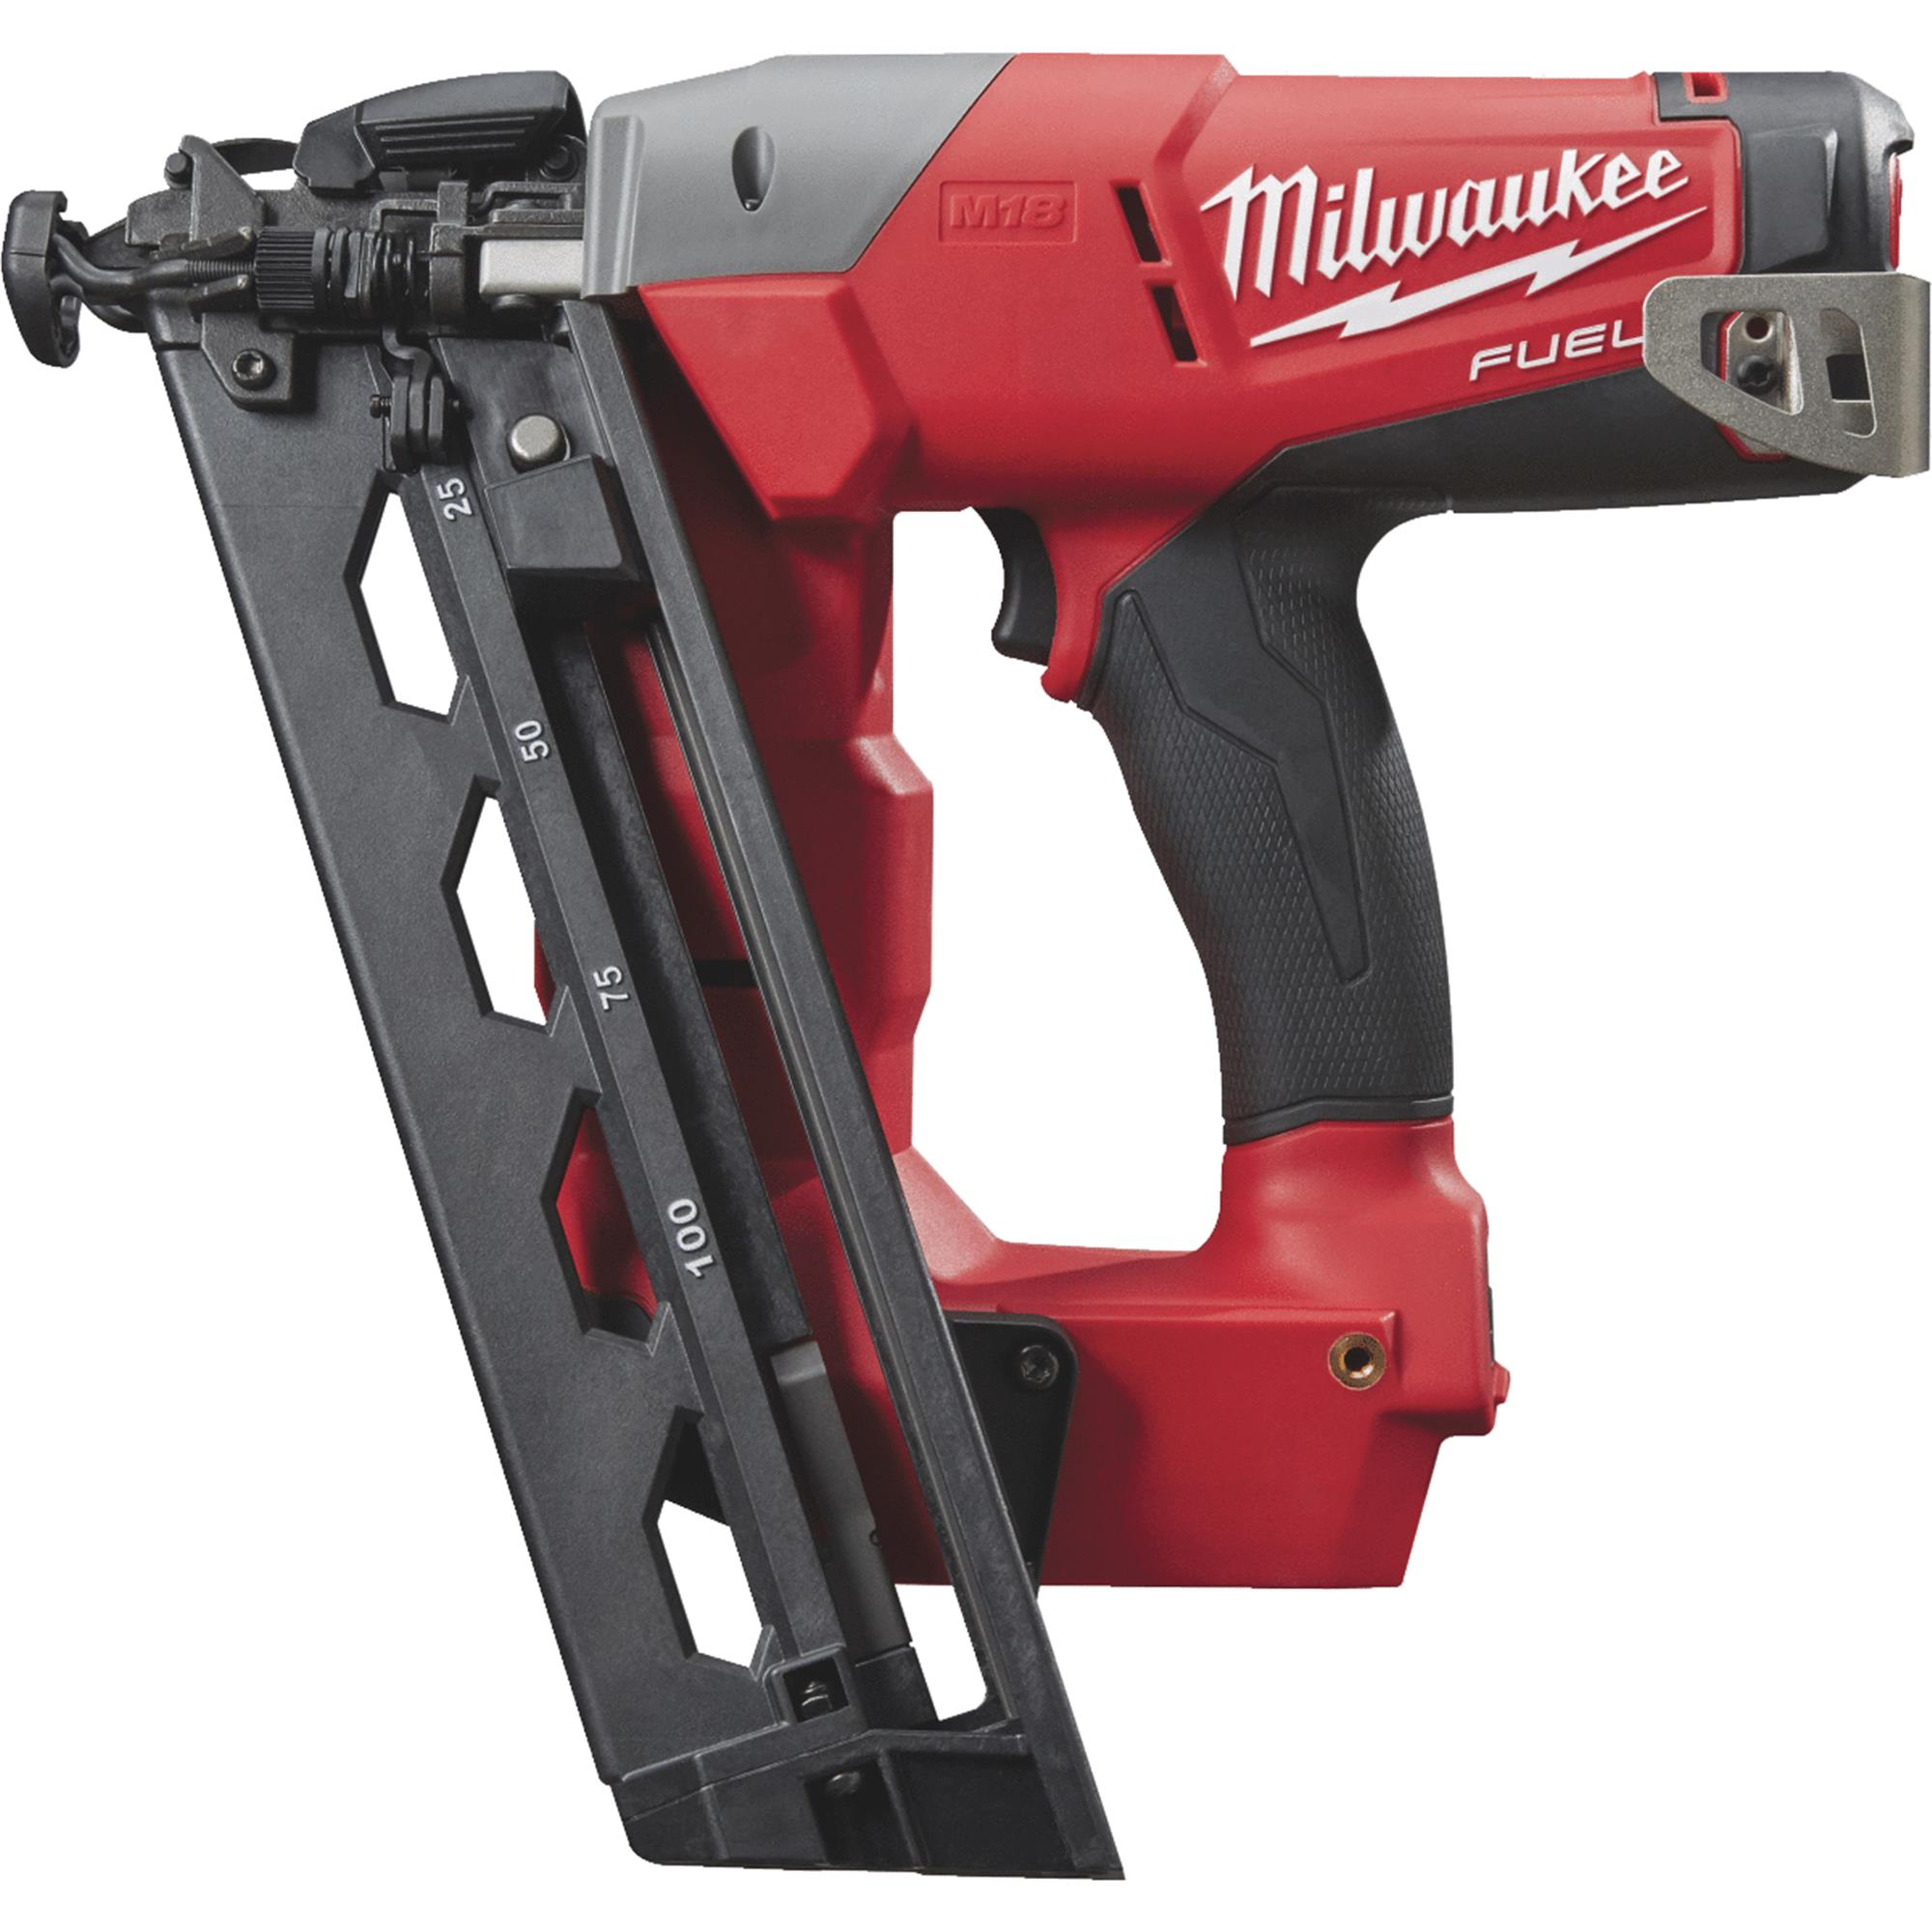 Milwaukee M18 FUEL Brushless Cordless Finish Nailer Bare Tool by Milwaukee Elec